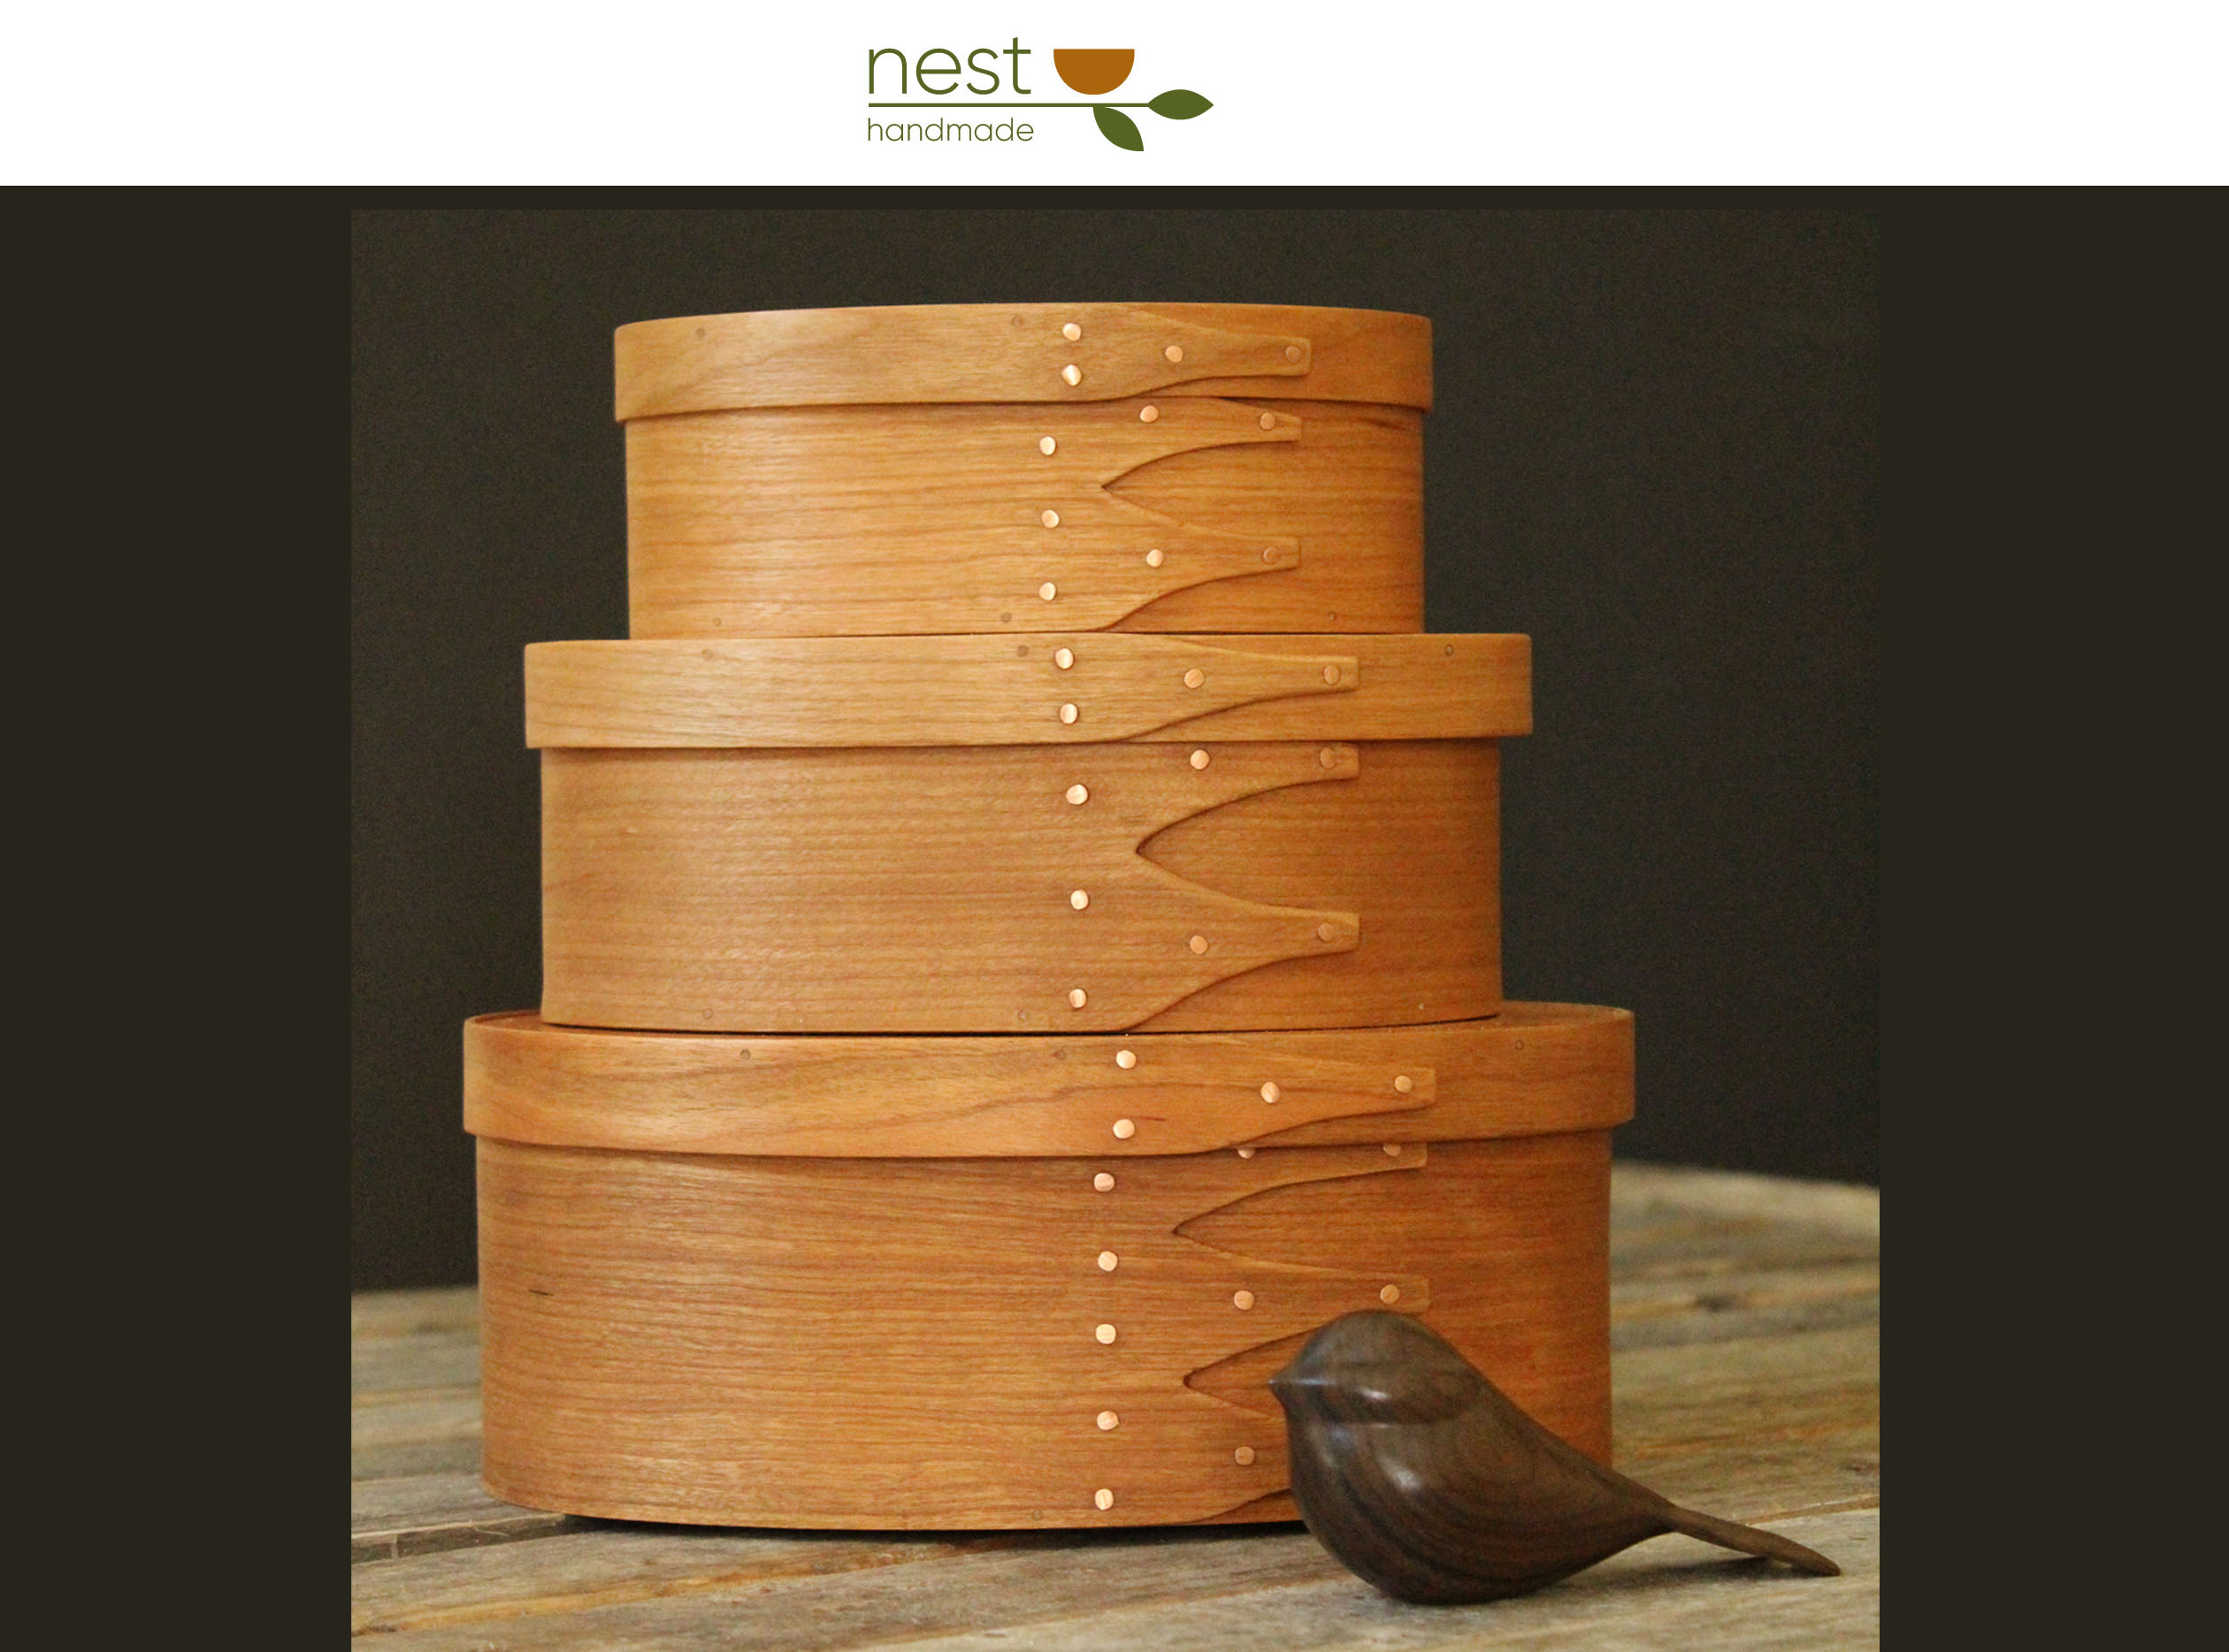 Nest Handmade